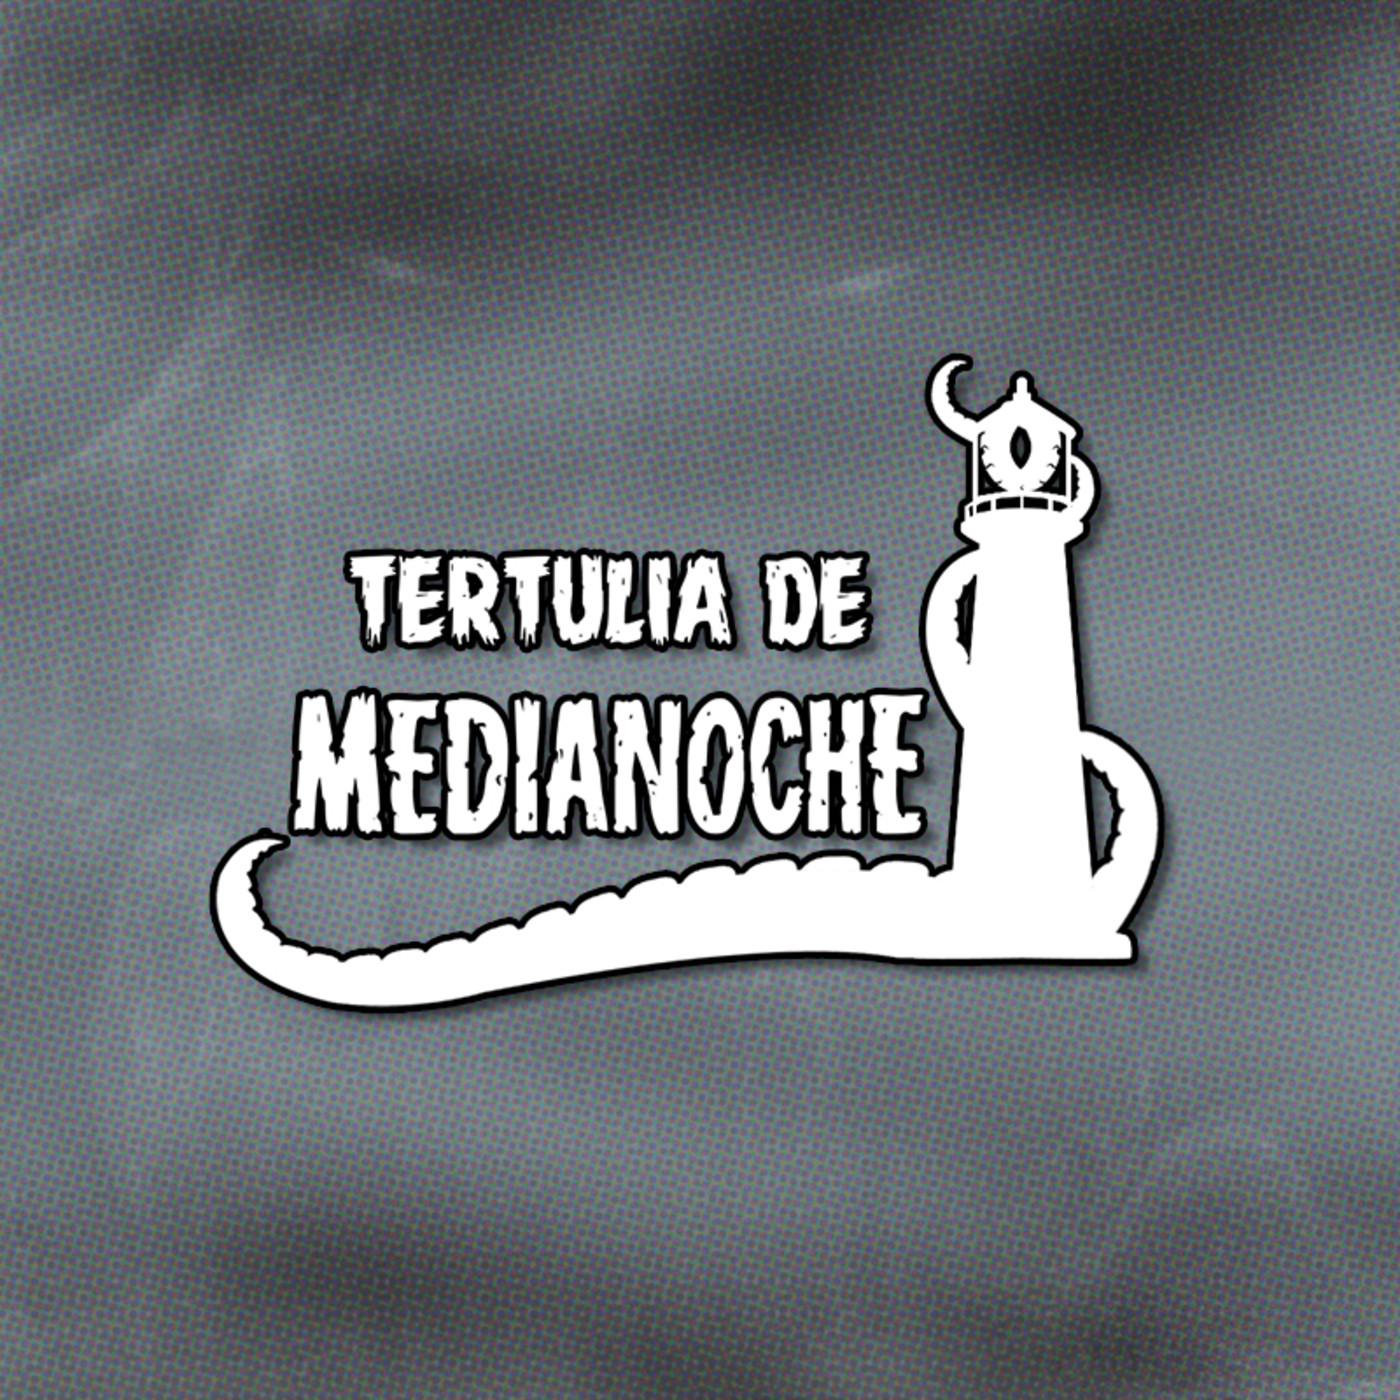 Tertulia de Medianoche